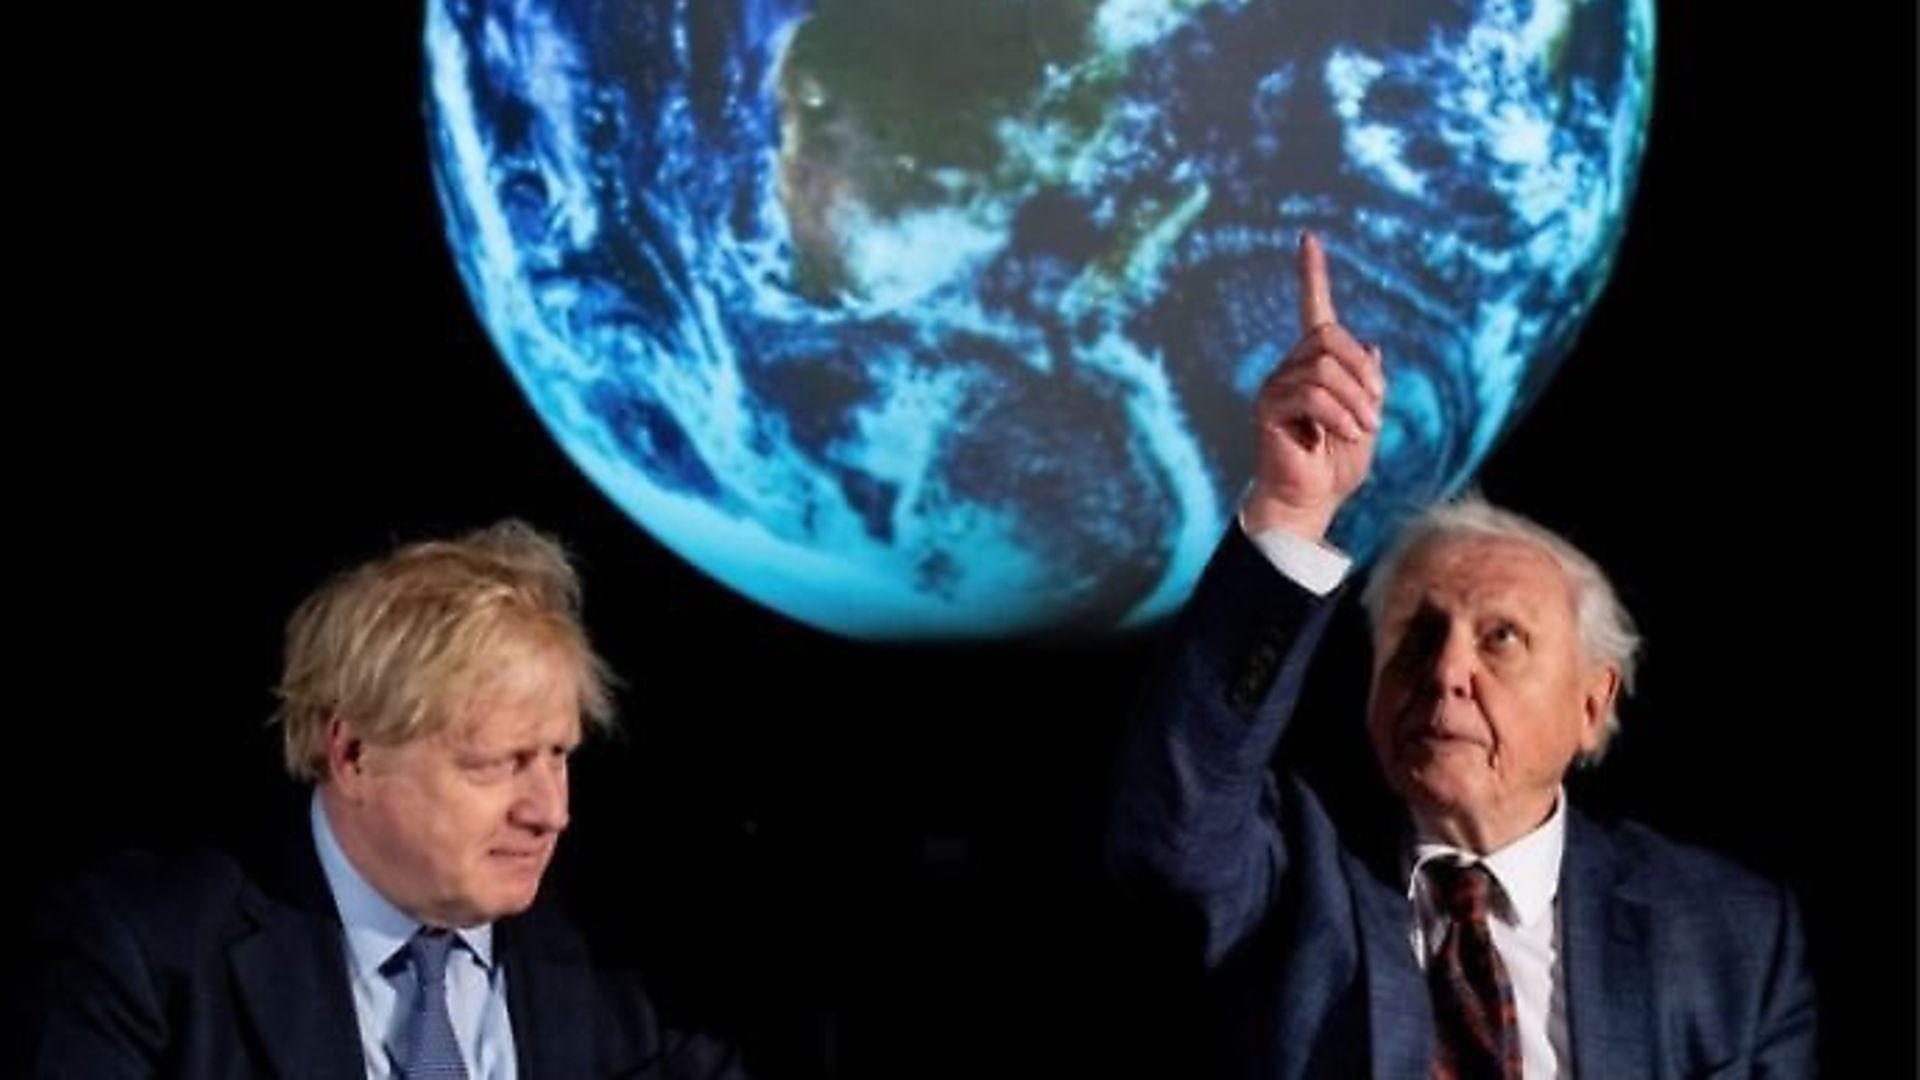 BBC presenter Sir David Attenborough with Boris Johnson. Photograph: Chris J Ratcliffe/PA Wire.